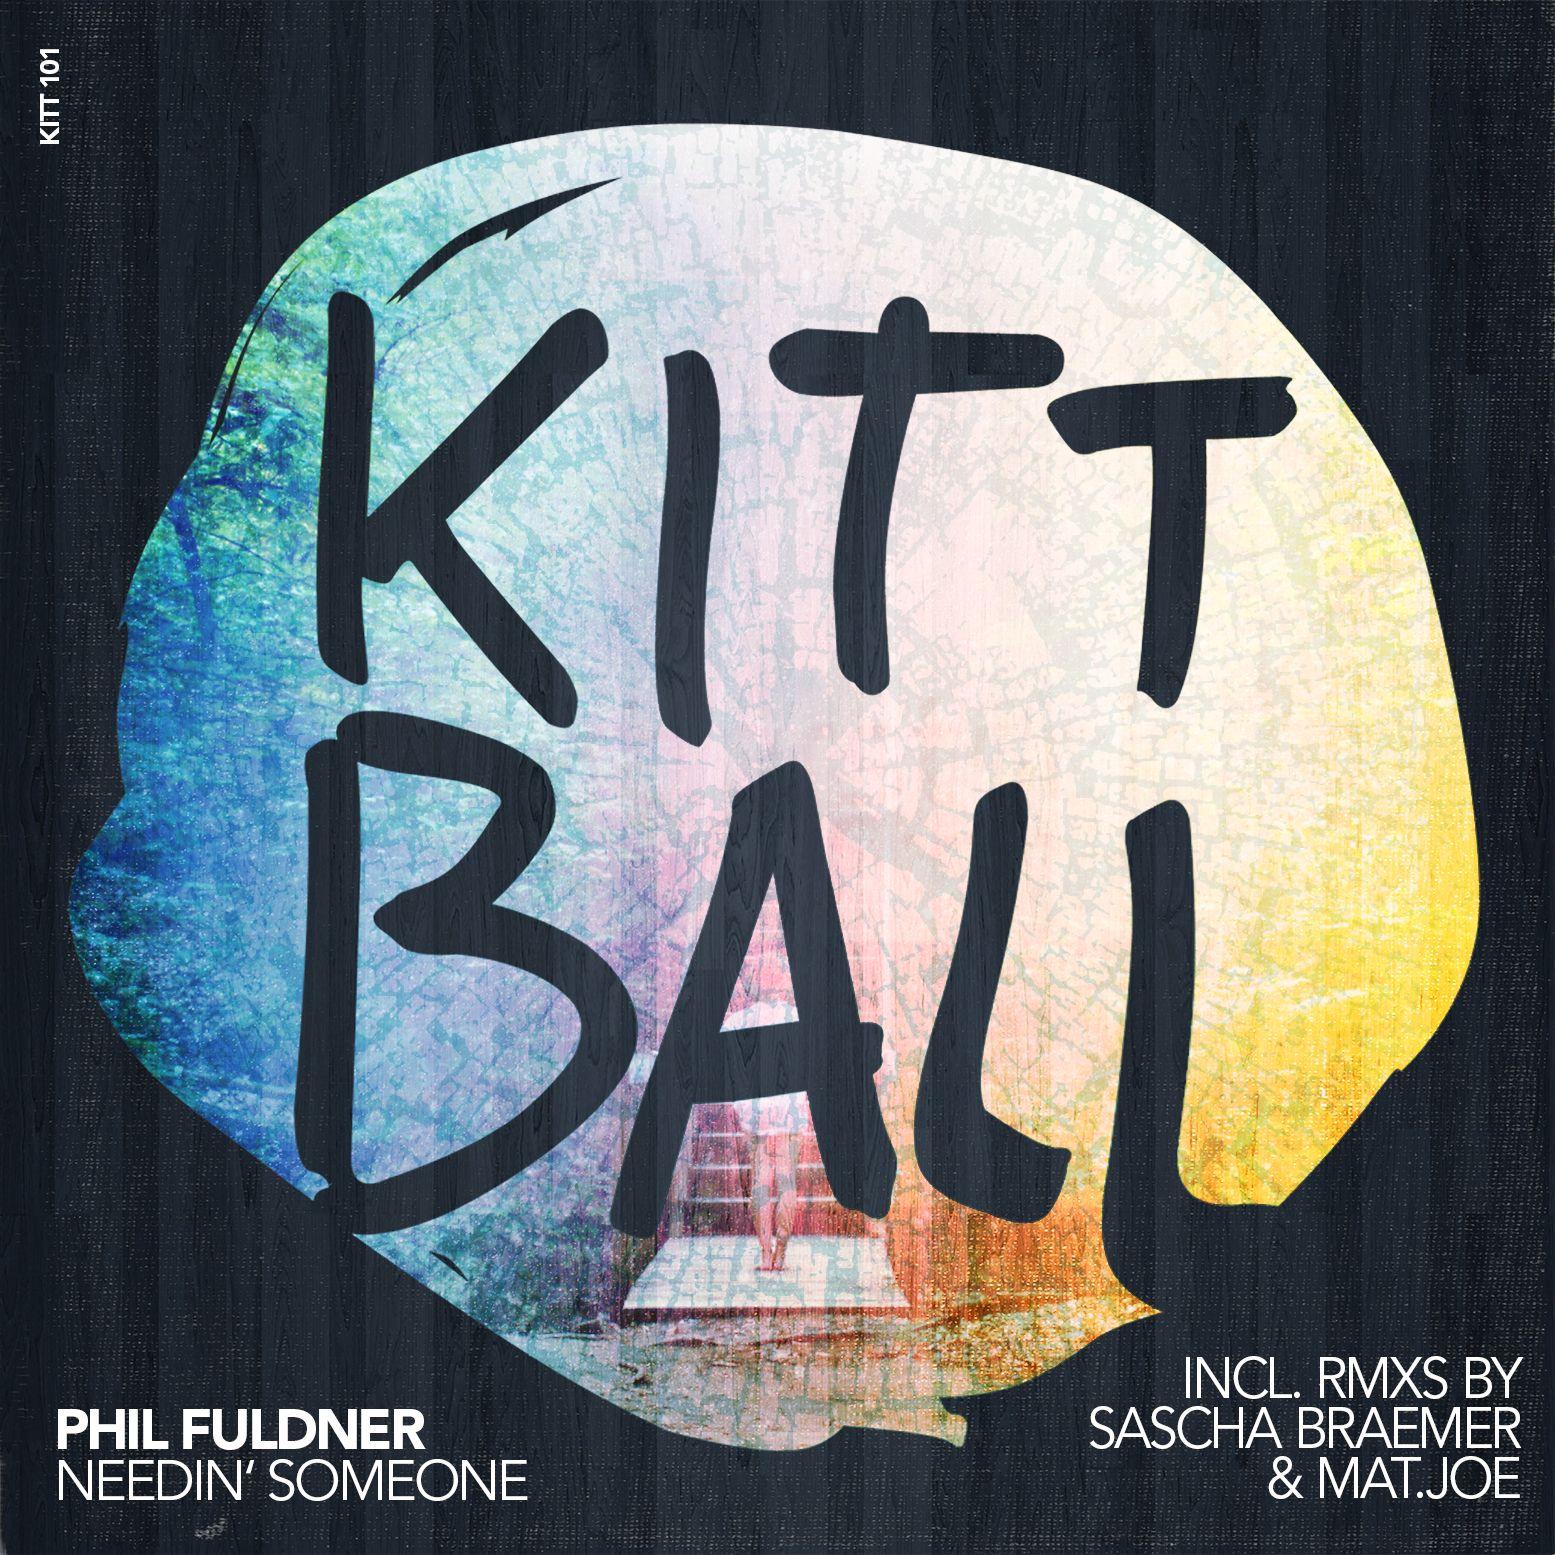 packshotphilfuldner-needinsomeoneep-kittballrecords.jpg